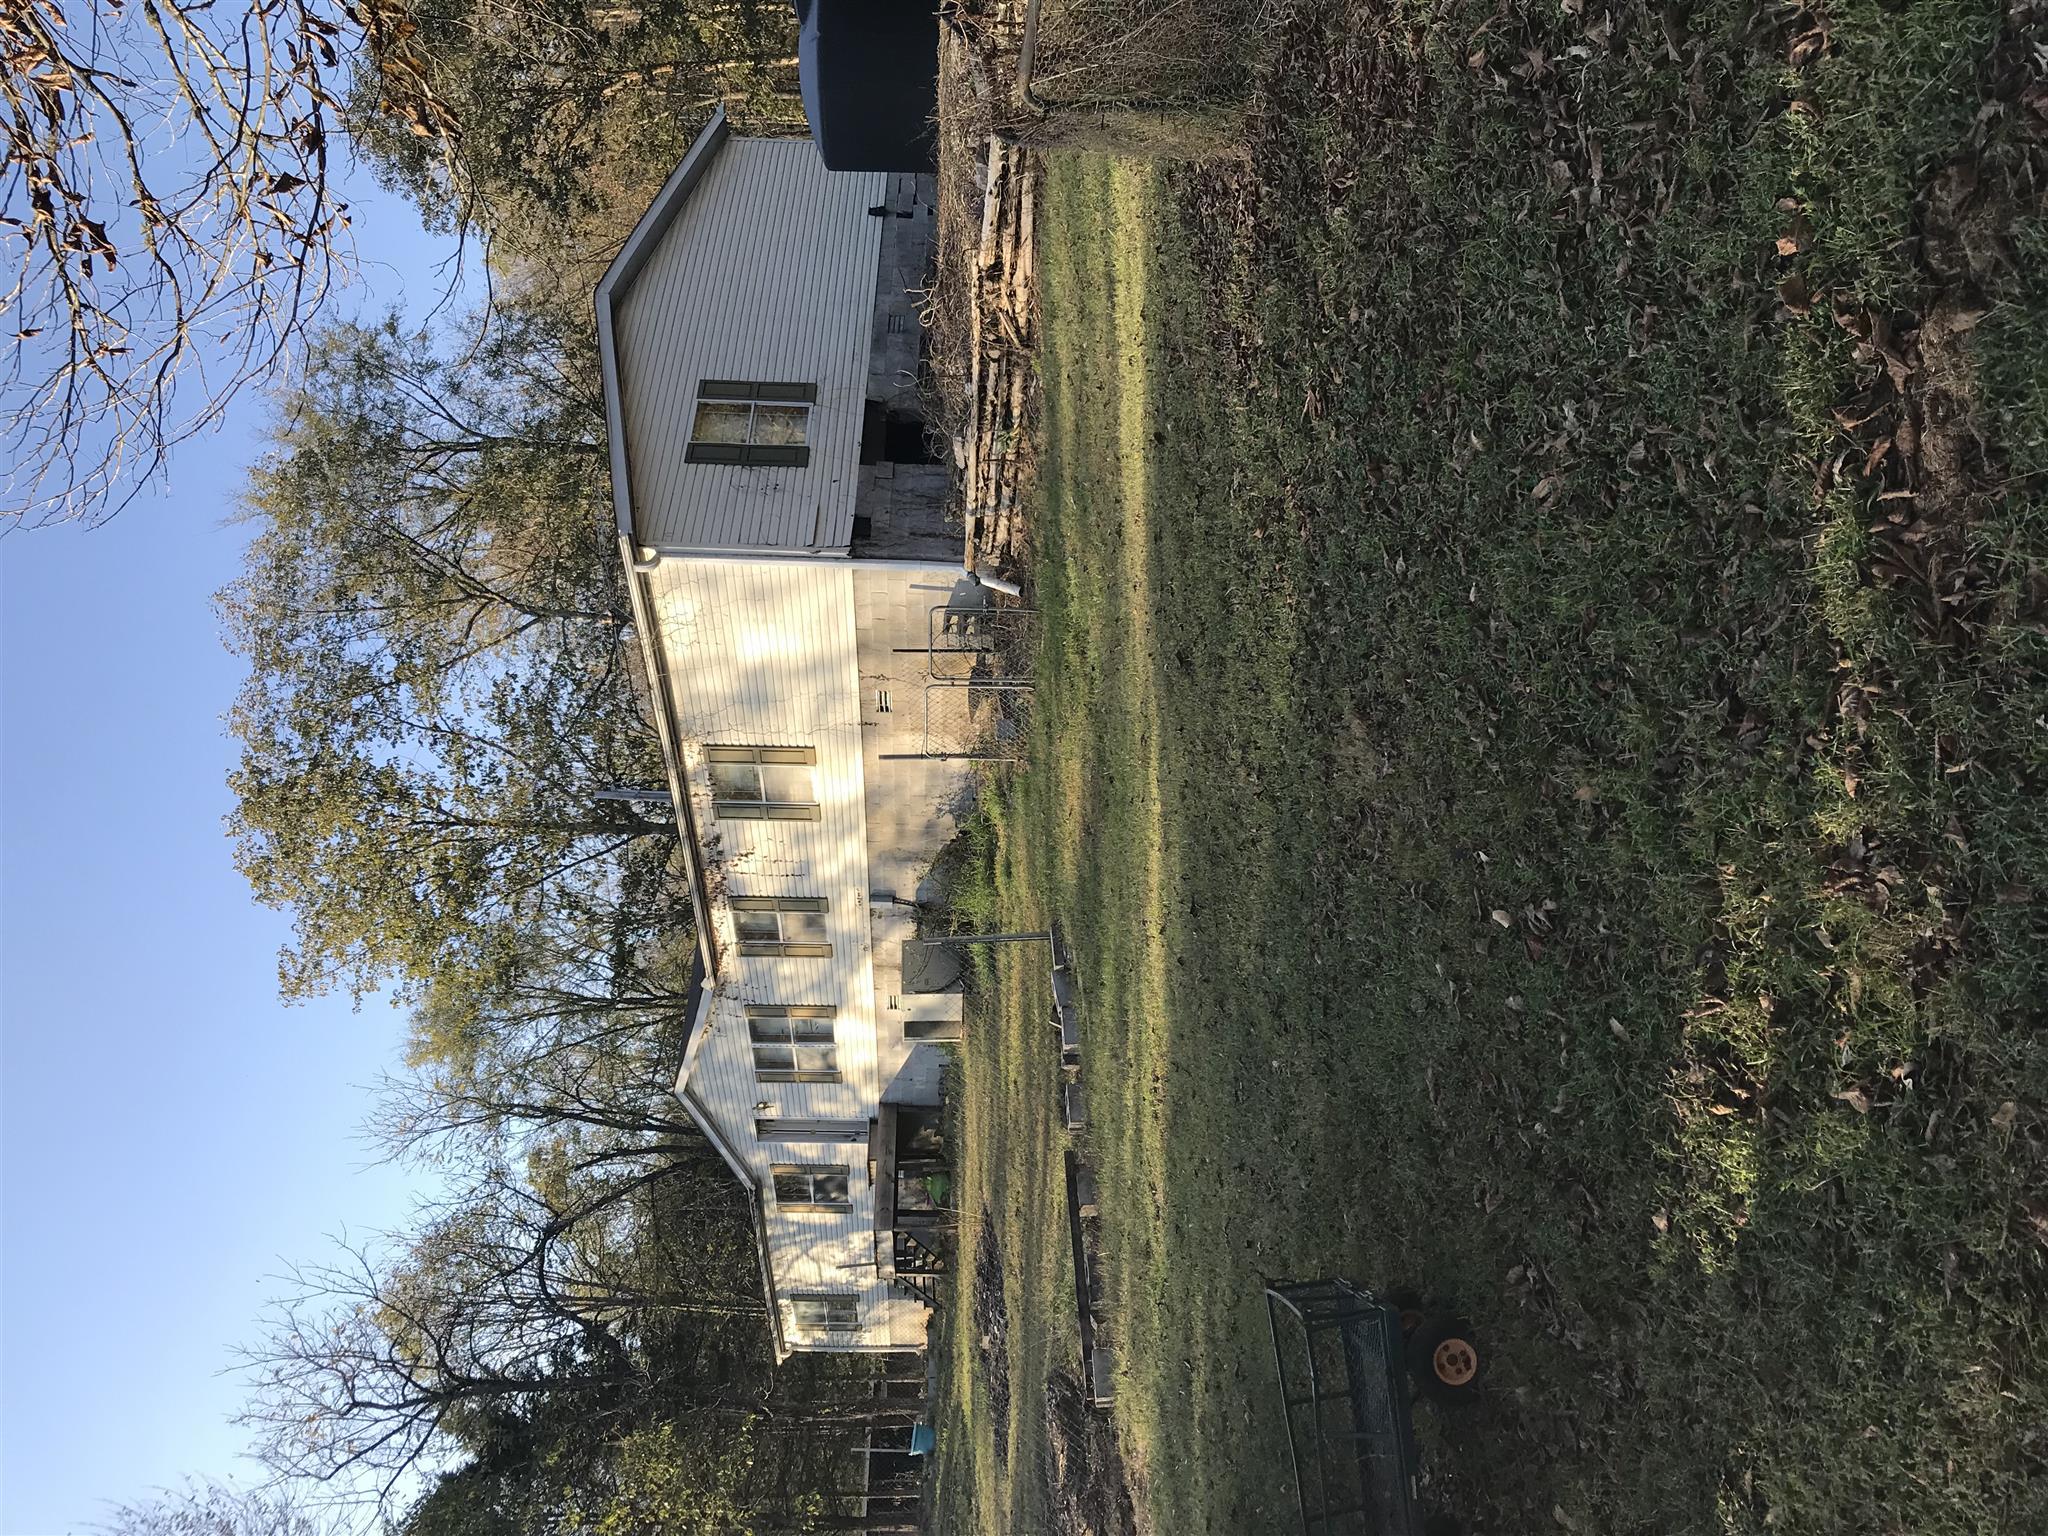 33 Gravel Ln, Brush Creek, TN 38547 - Brush Creek, TN real estate listing